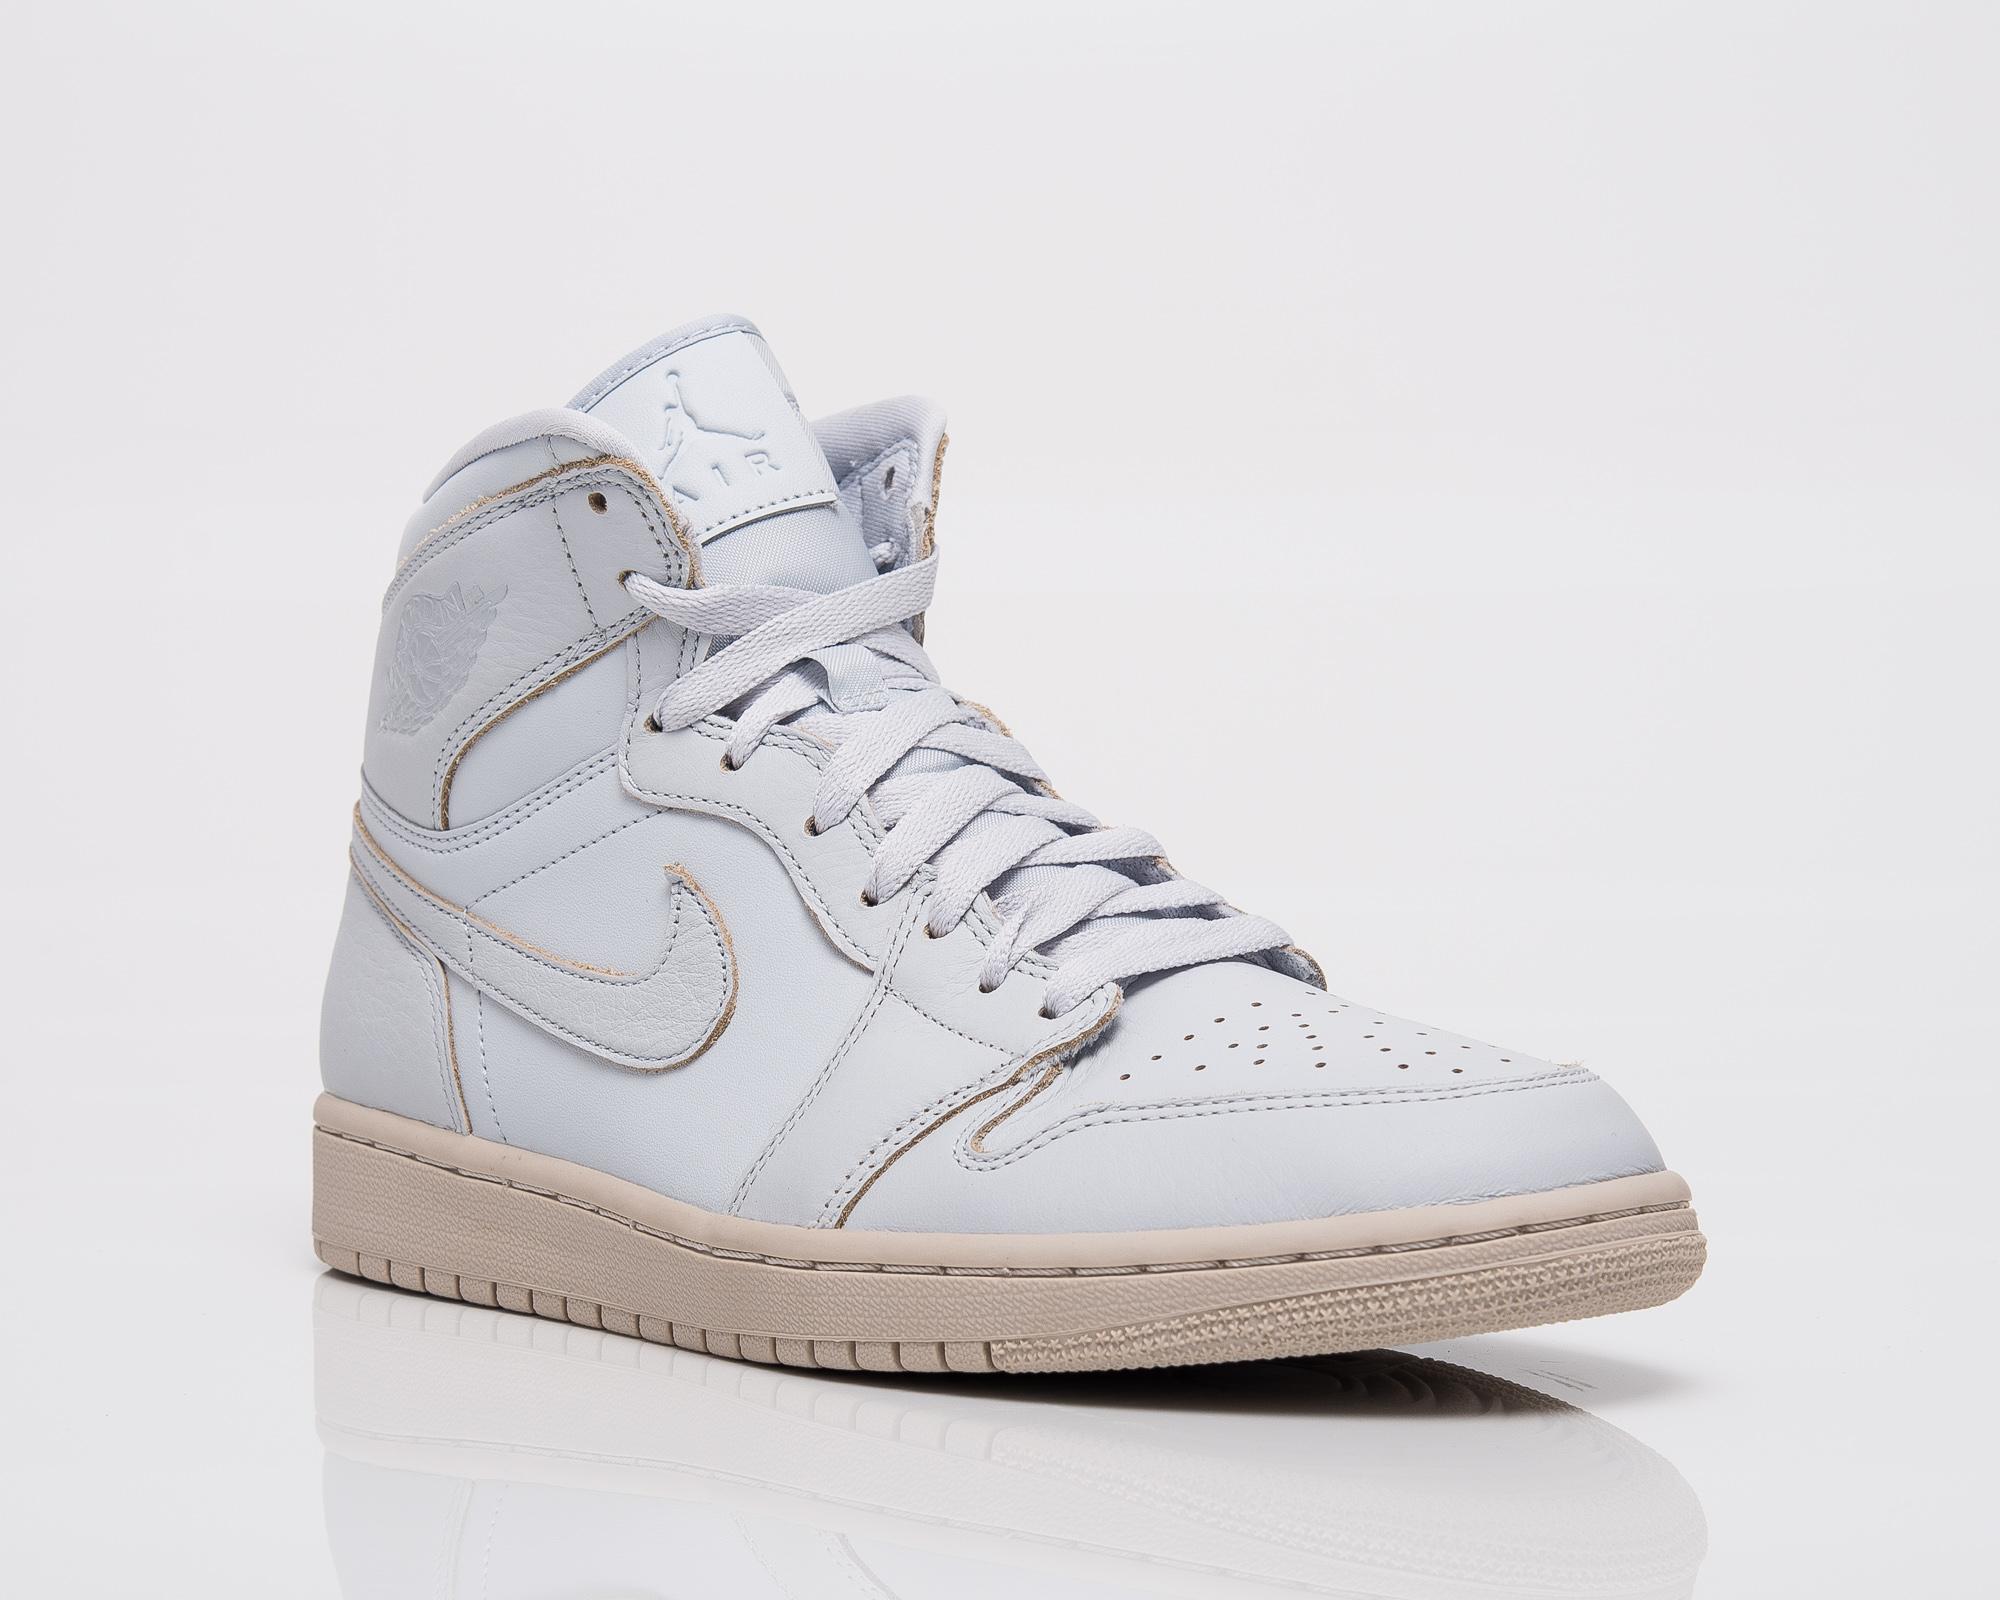 897906e7ff2f Air Jordan 1 Retro High Premium Pure Platinum - Shoes Casual ...